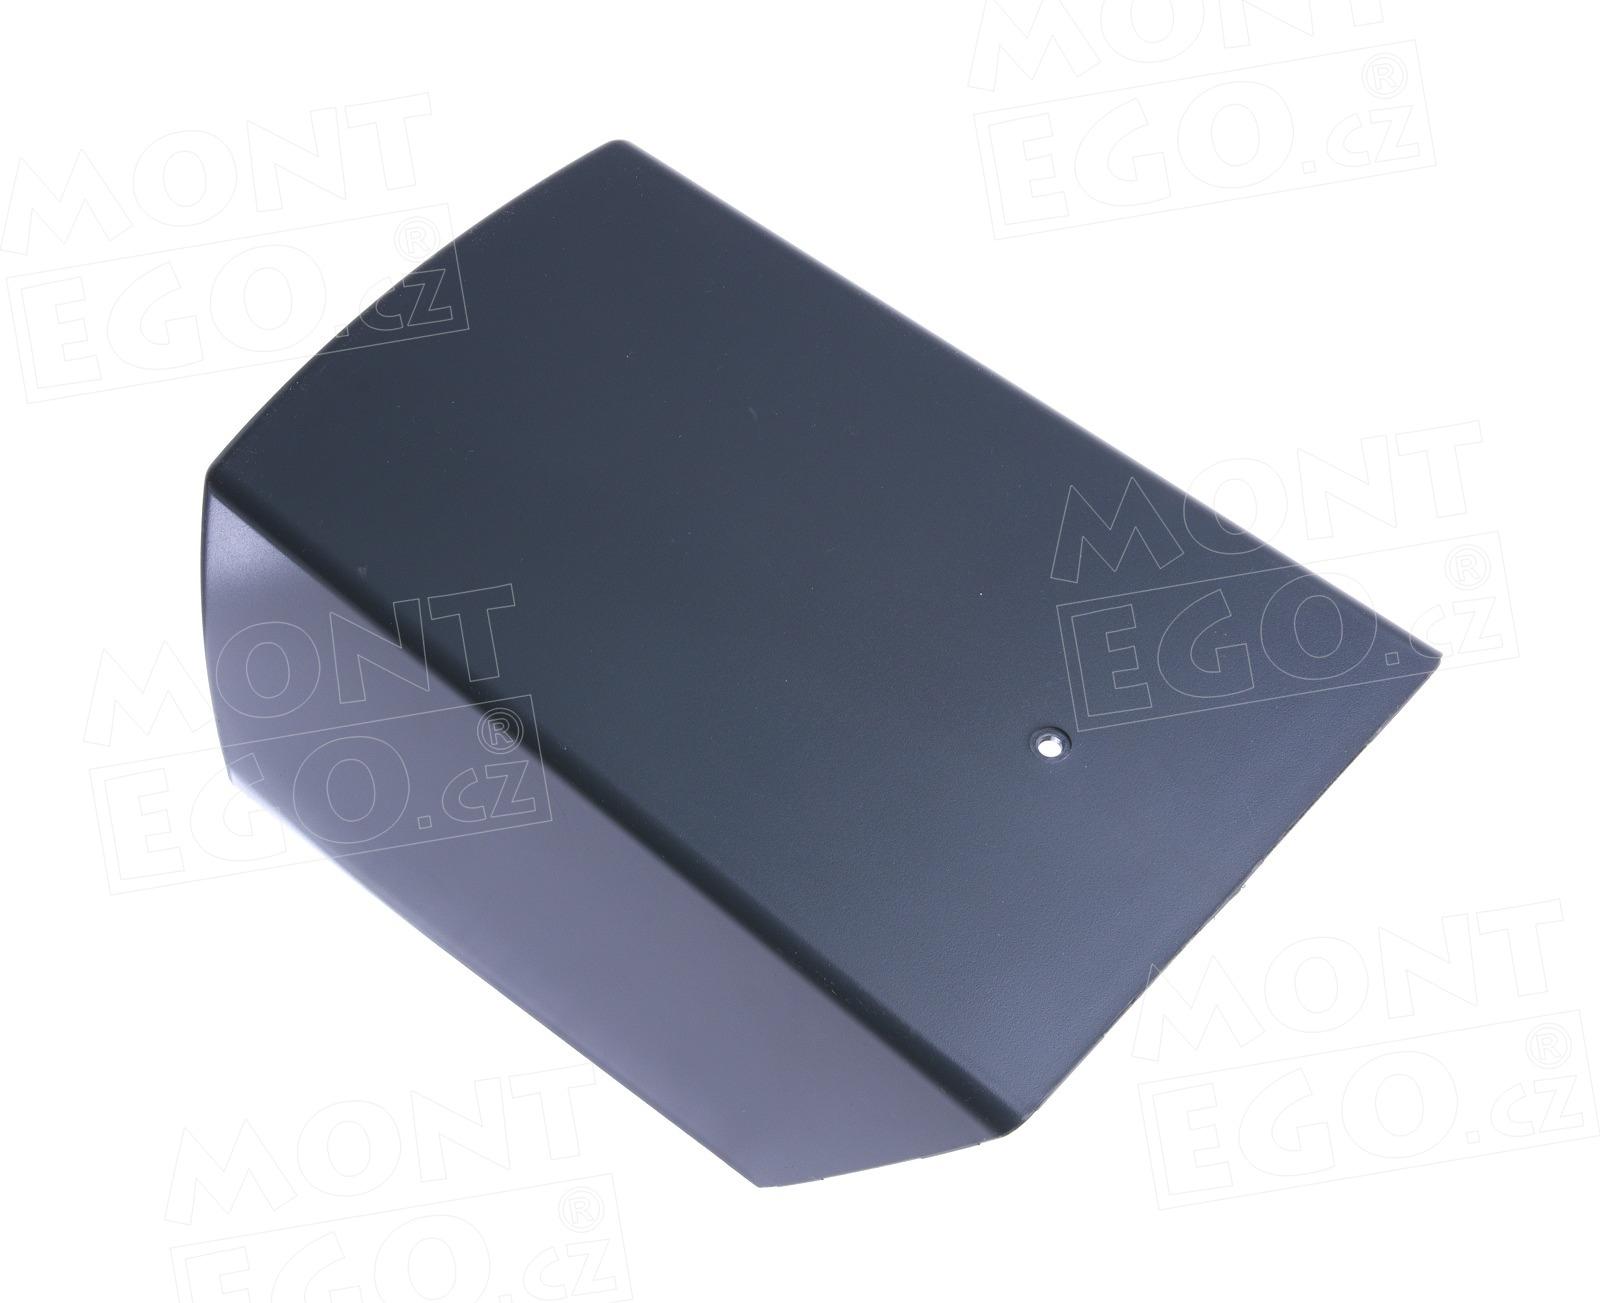 PPD0893A.4540 vrchní kryt elektronik pro pohony bran Nice Robus RB3500, RB400, ROAD200, ROAD400